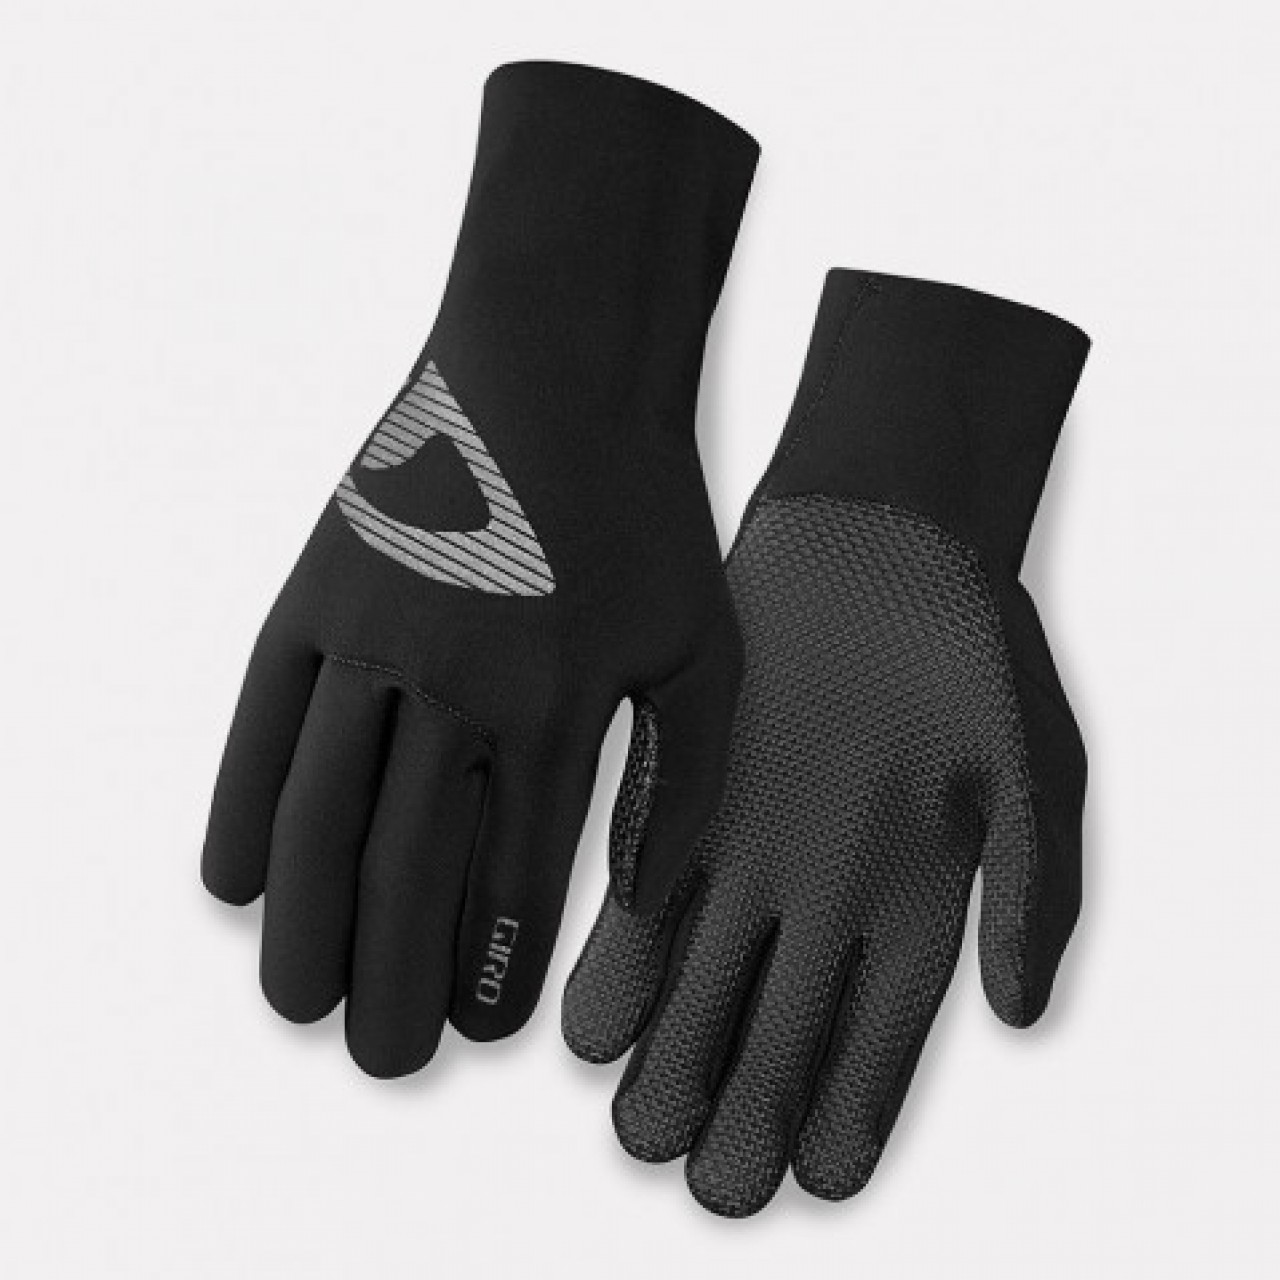 giro neo blaze handschuhe 24 90. Black Bedroom Furniture Sets. Home Design Ideas